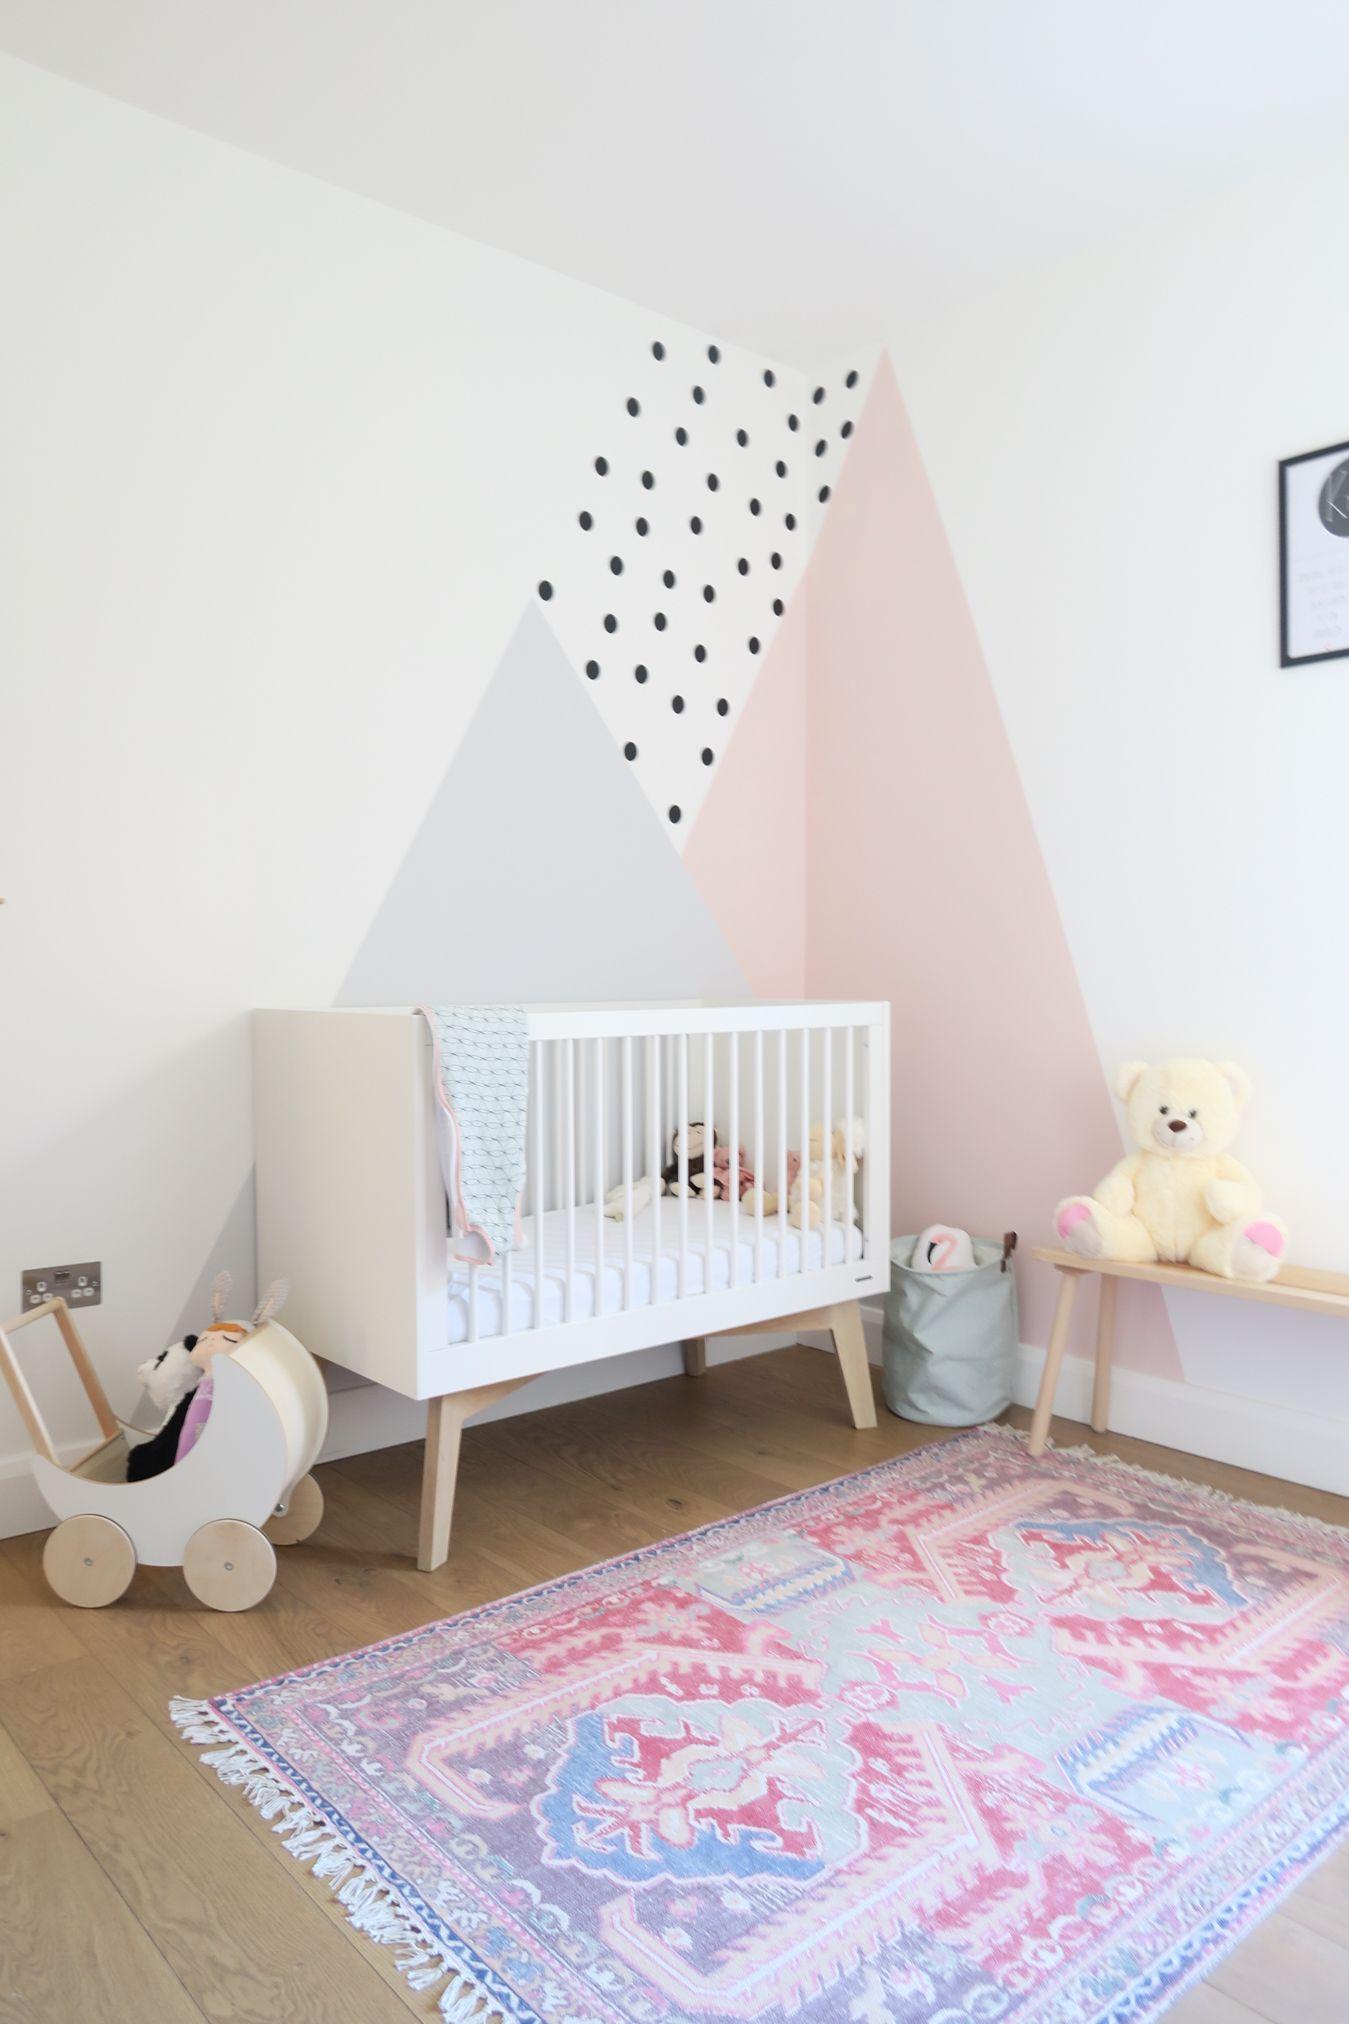 Binnenkijker In Londen Blogger Festiv Showt Haar Engelse Huis Babykamer Decoratie Babykamer Meisjes Babykamer Kast